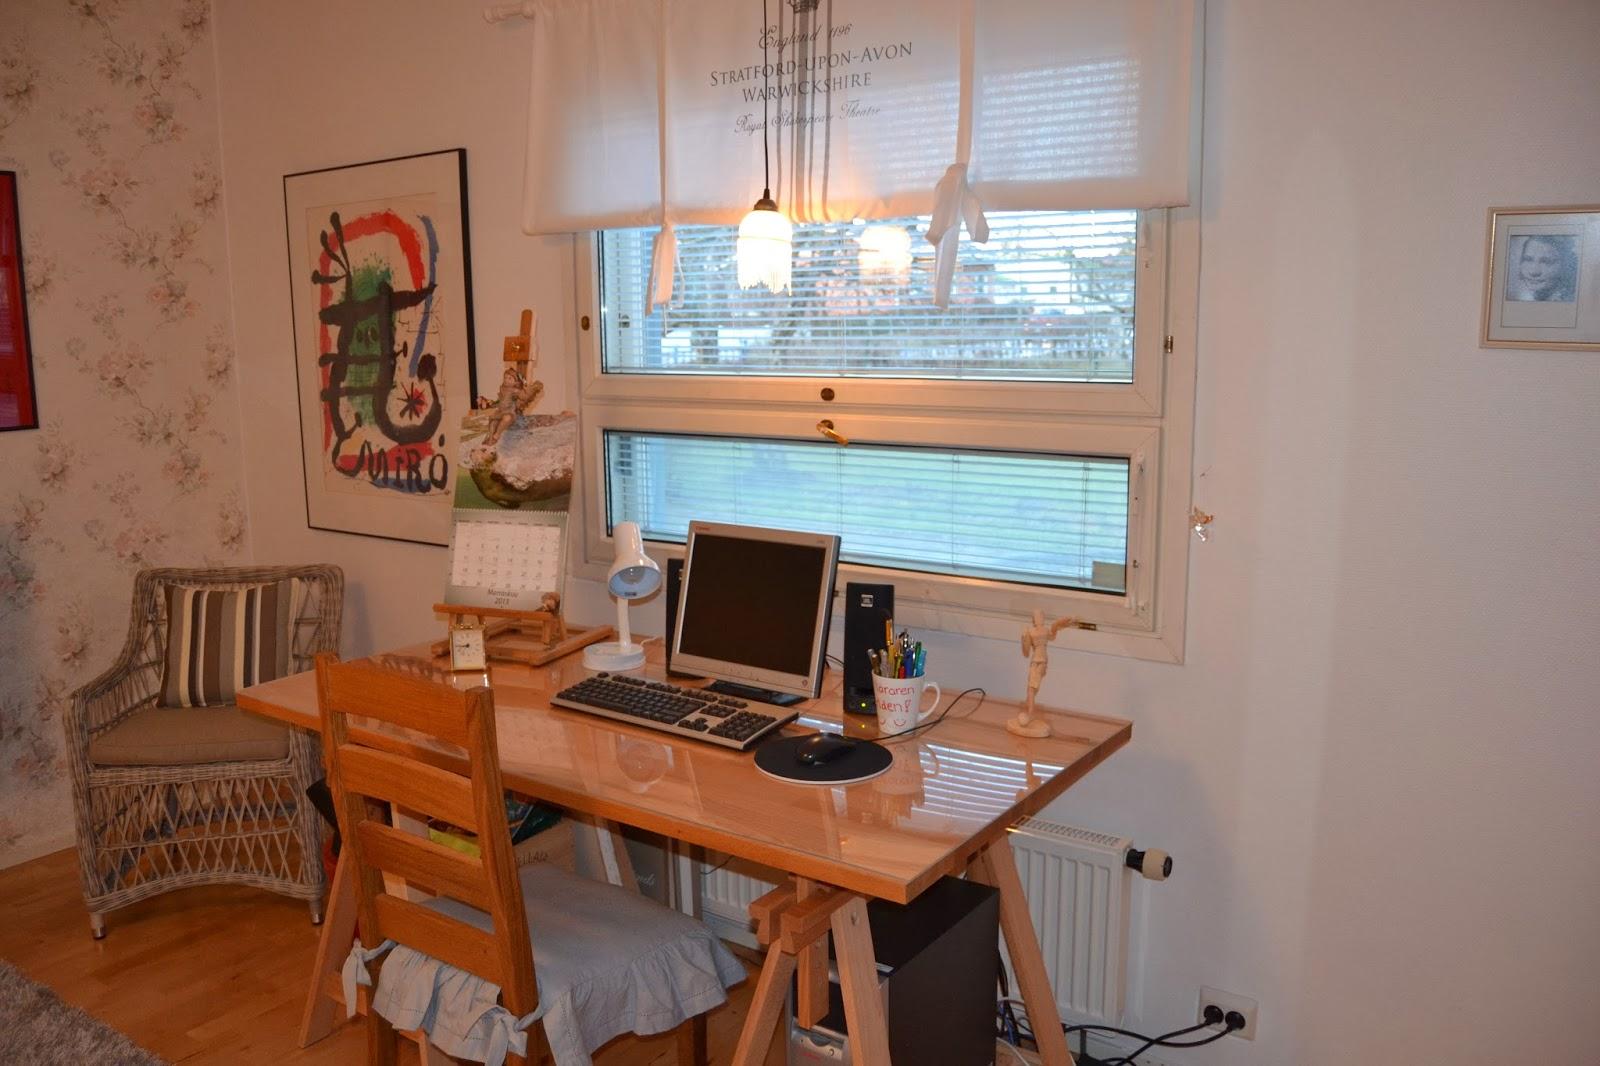 Työhuone – Work space